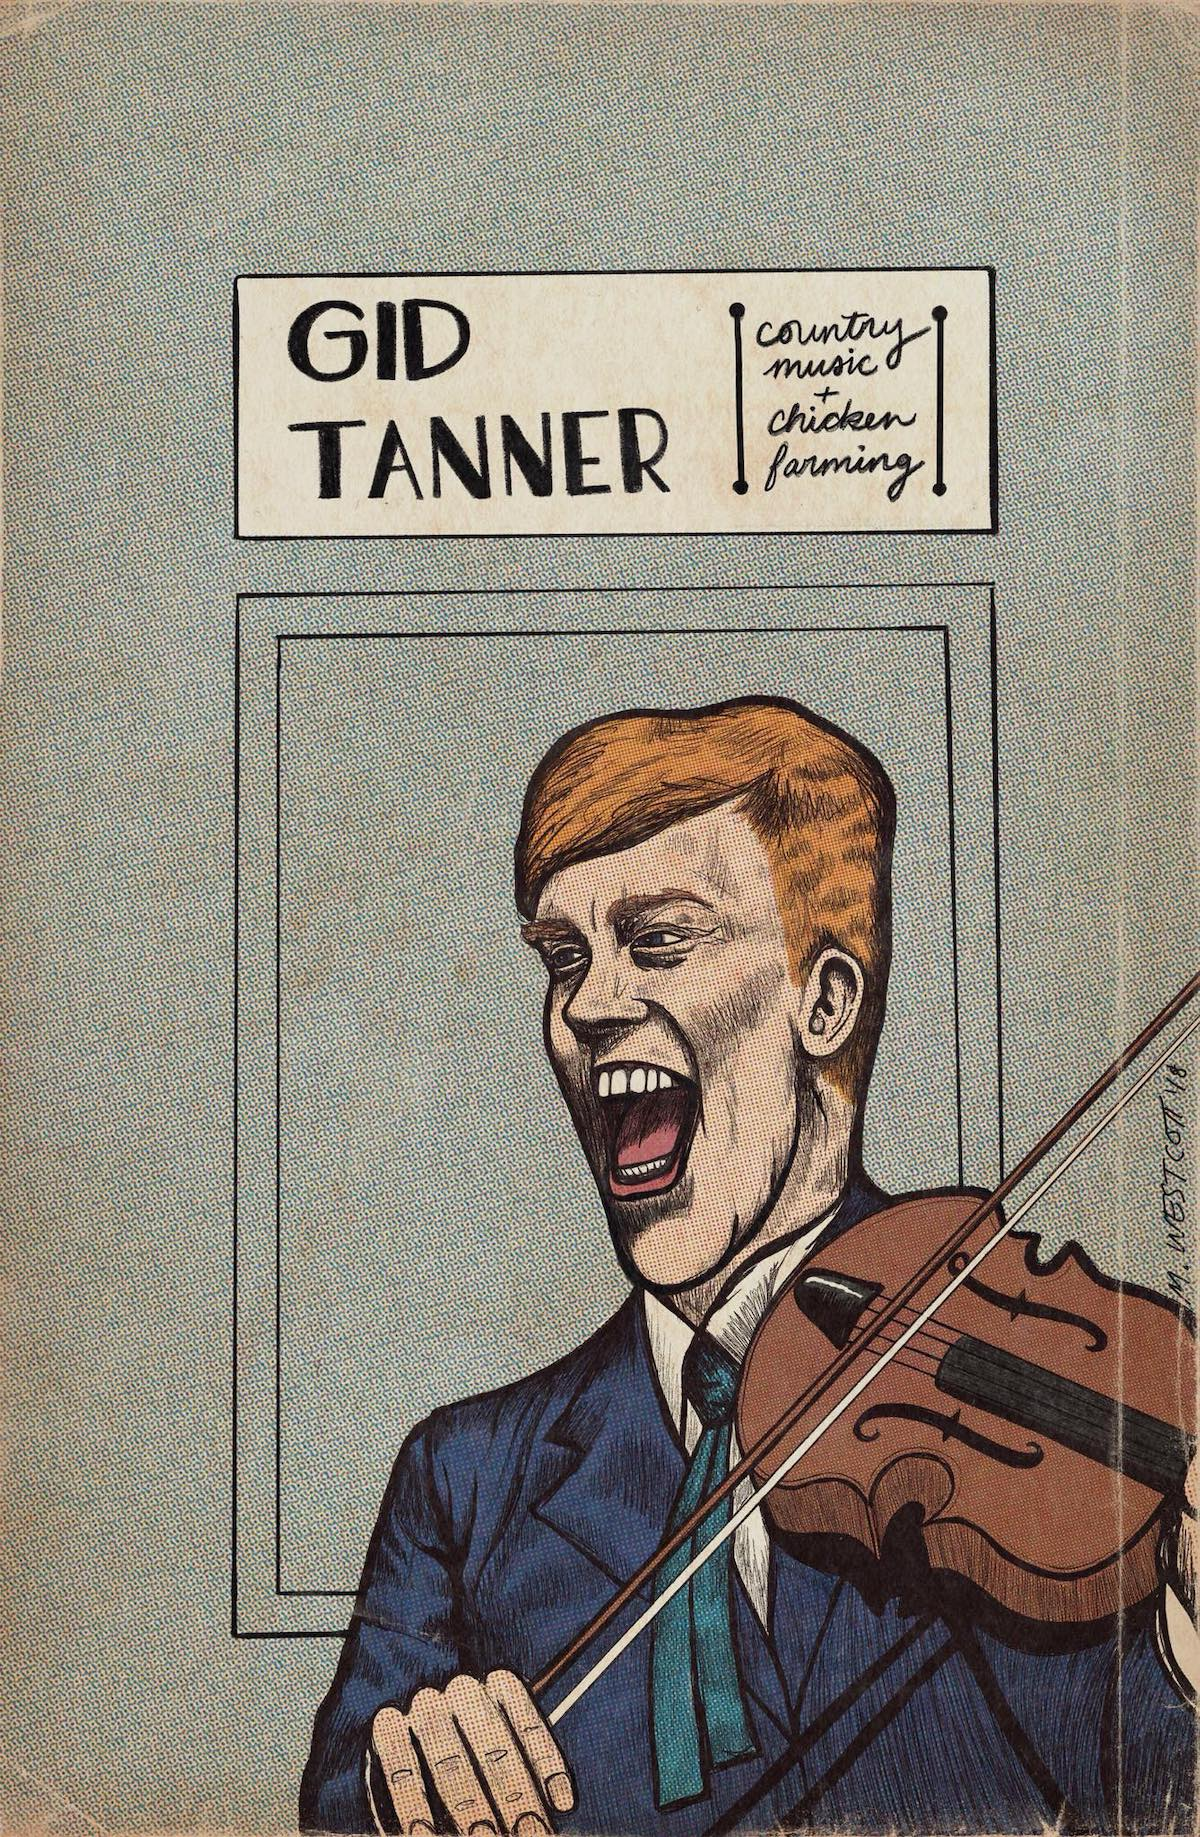 Gid Tanner by Megan Westcott